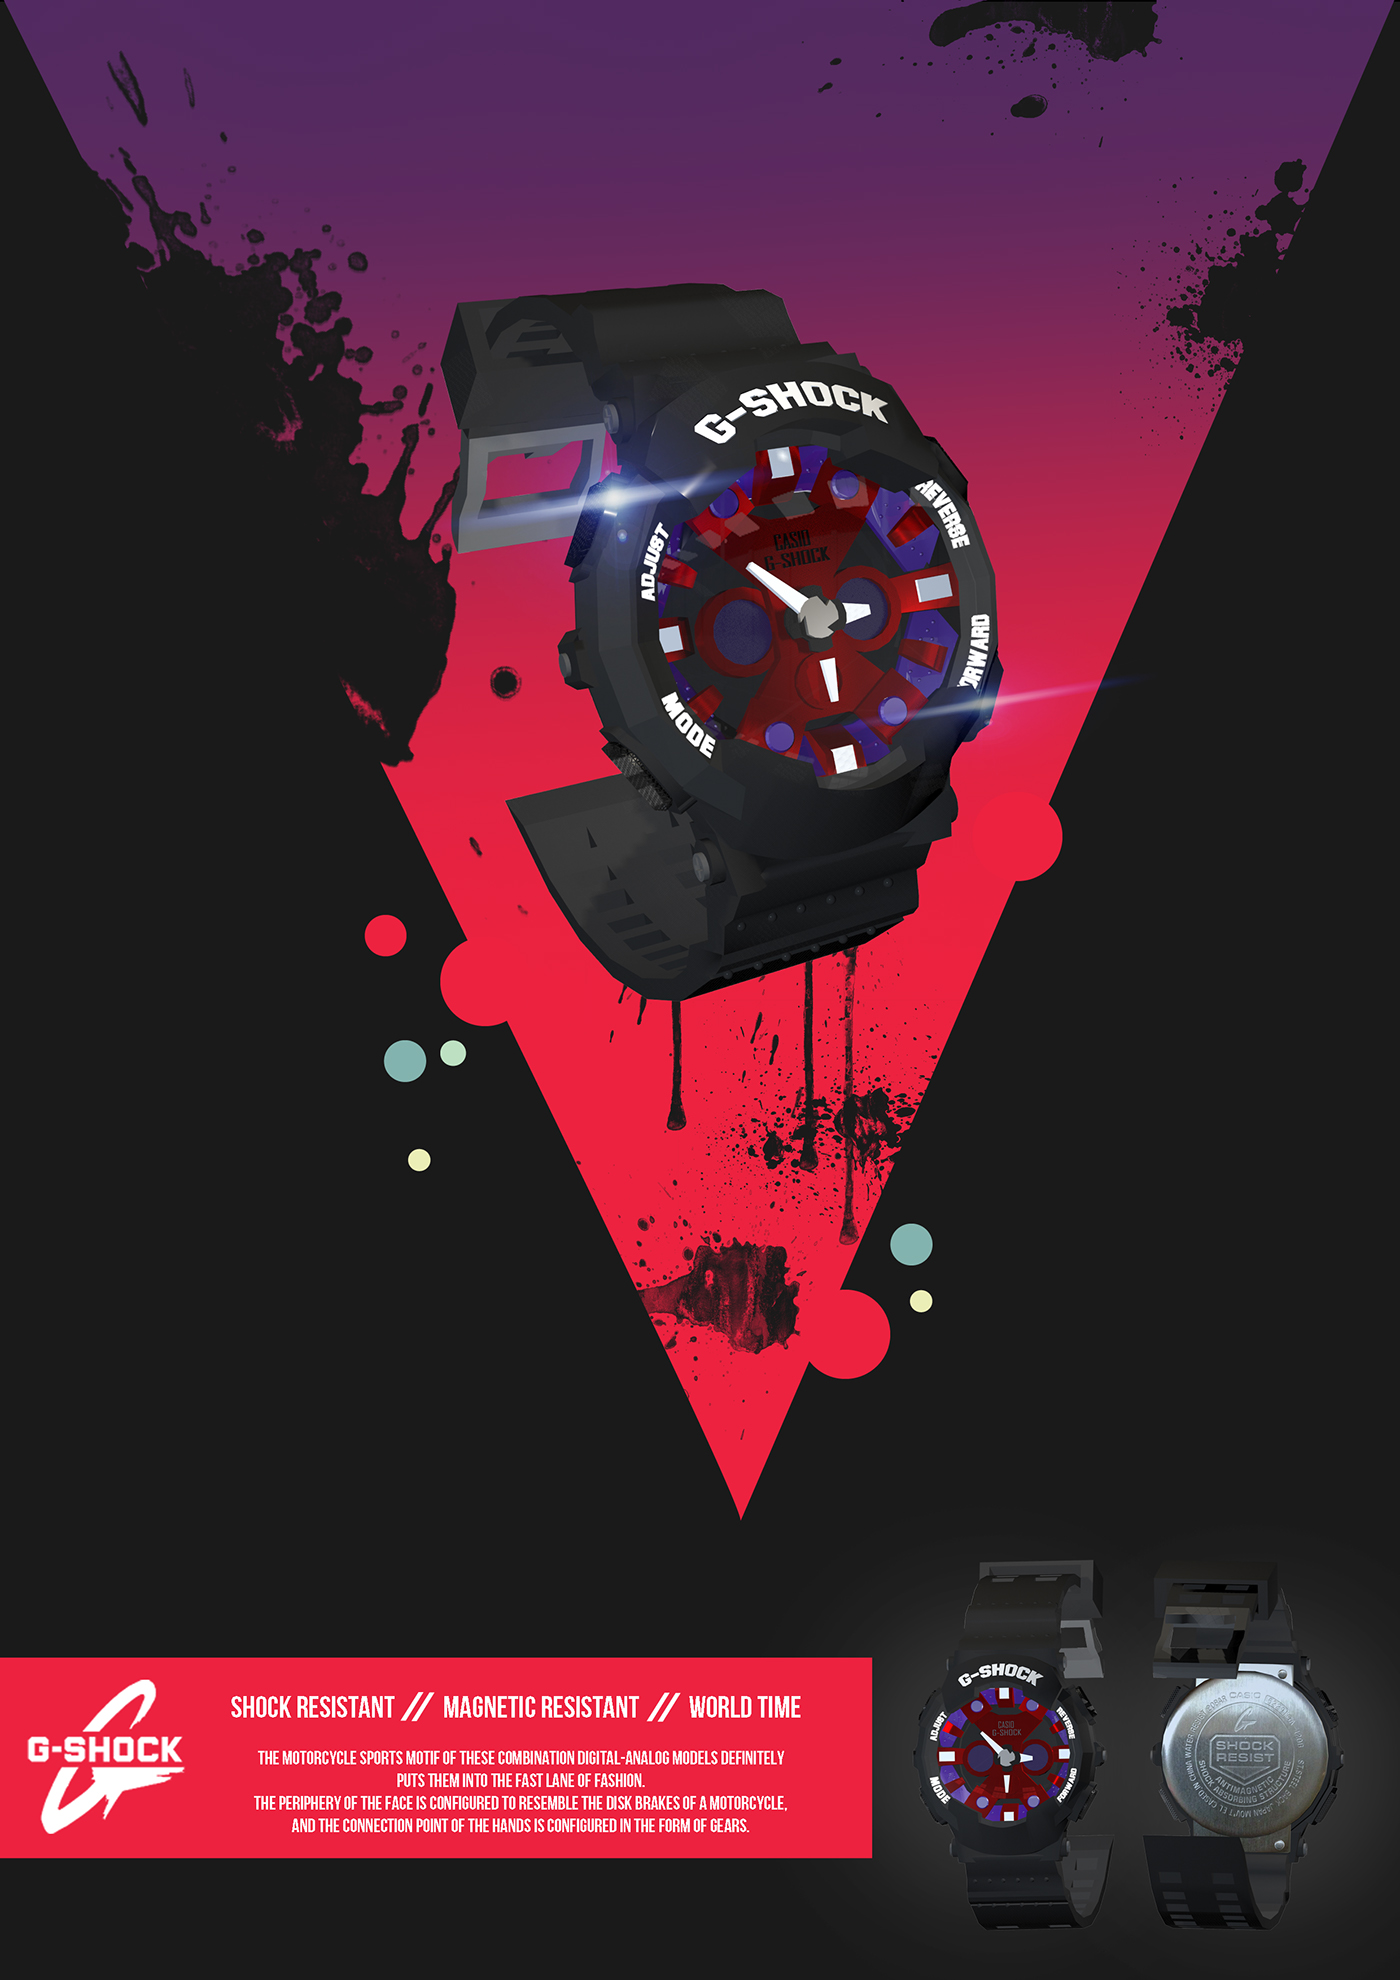 3d Wallpaper Malaysia G Shock Ga120b 3d Modeling Poster Design Tvc On Behance